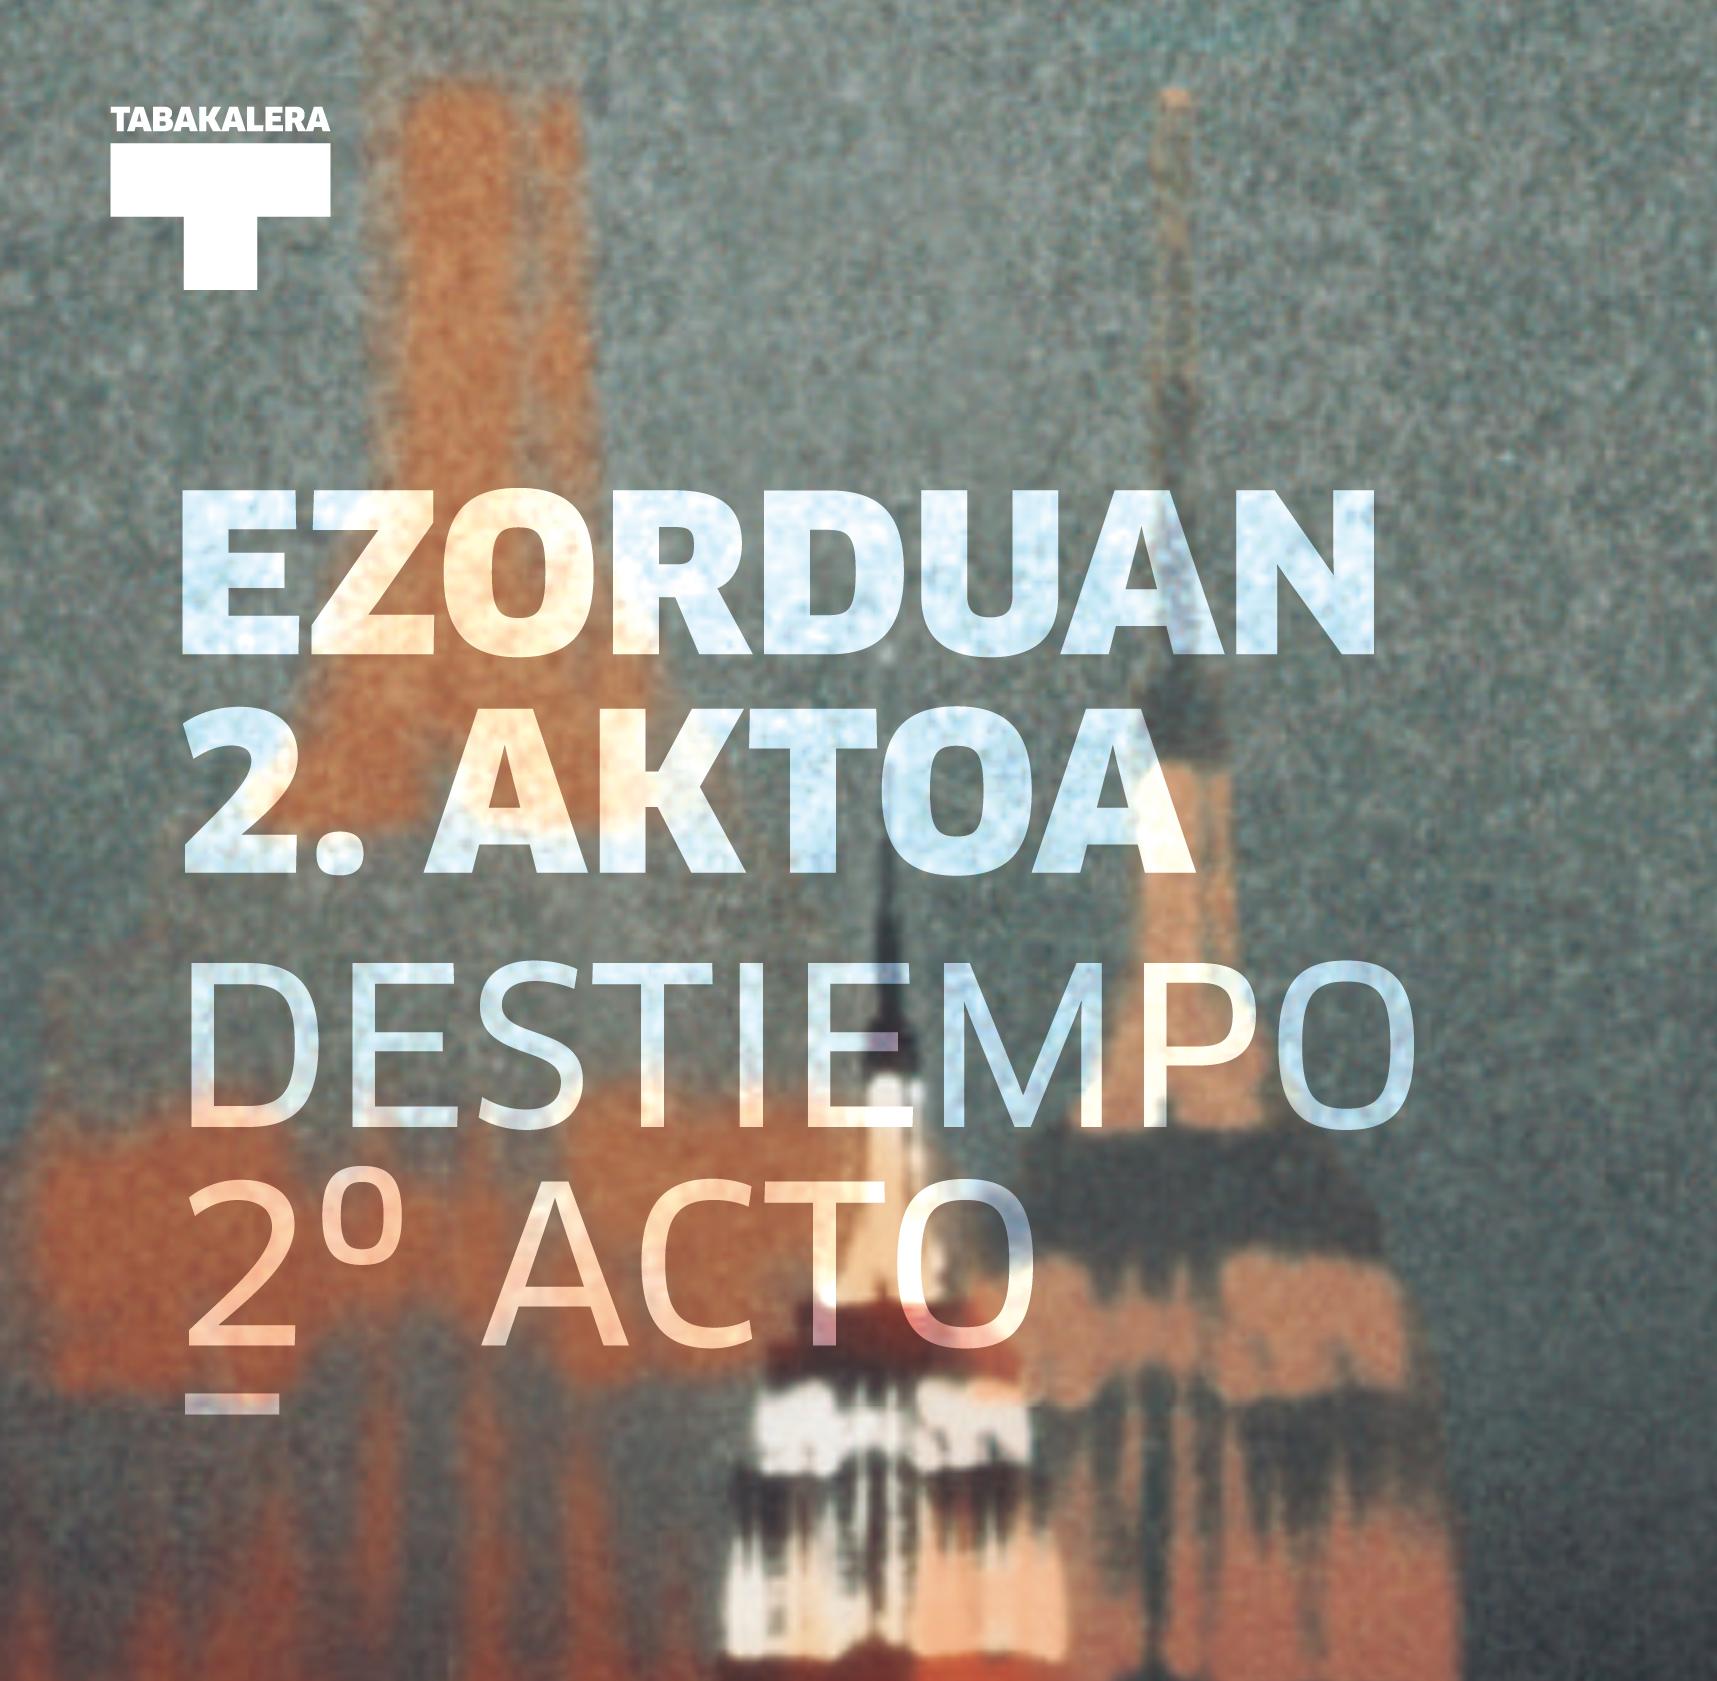 ezorduan_2-1